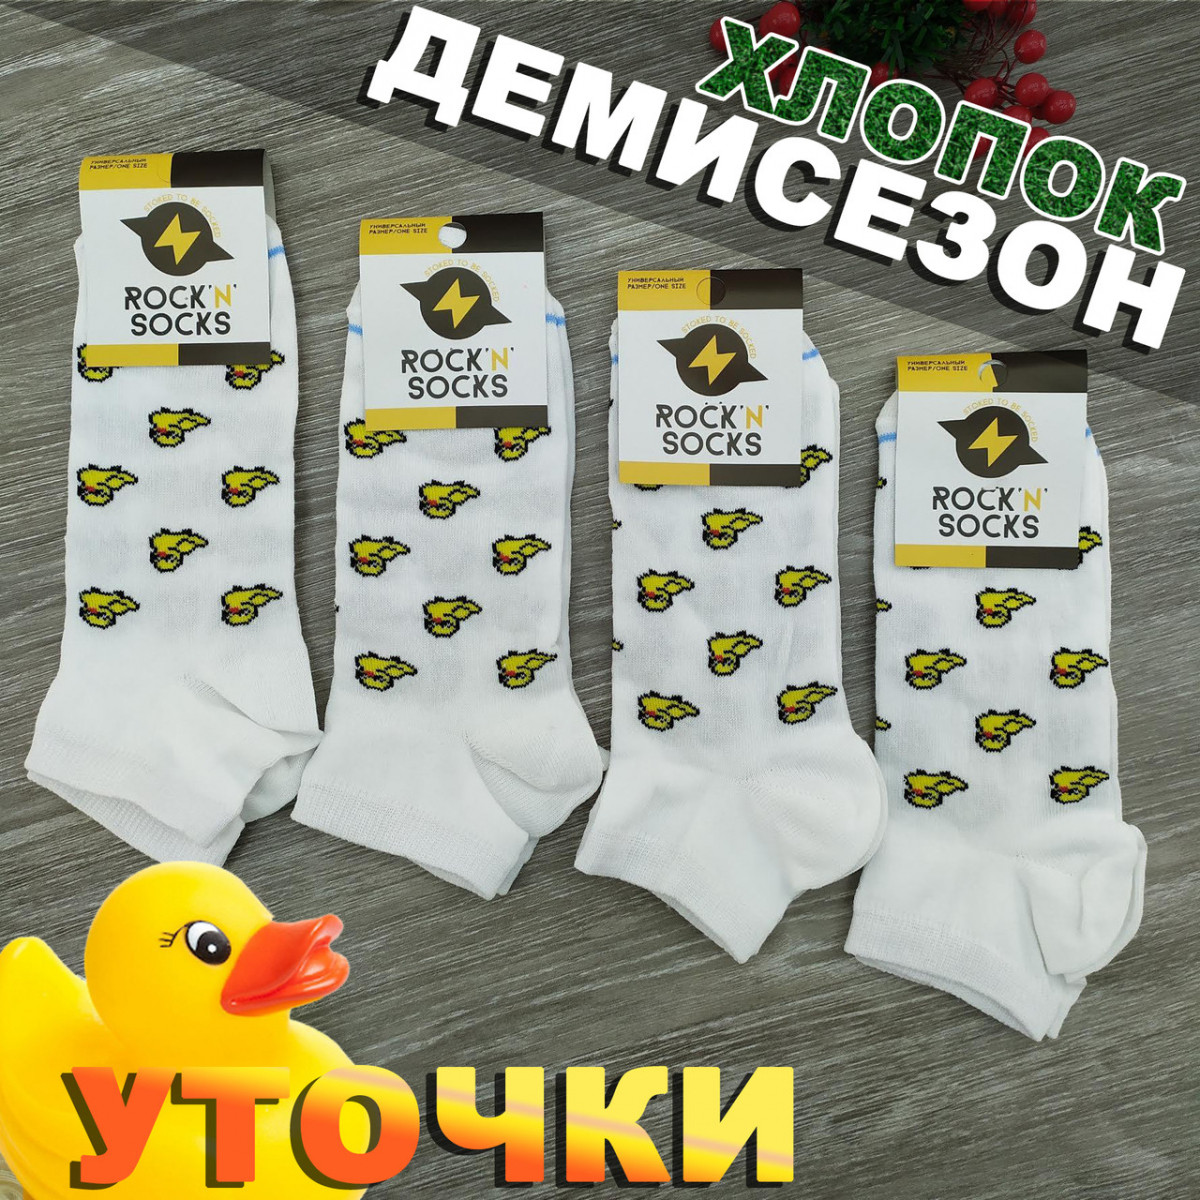 Носки с приколами демисезонные короткие Rock'n'socks 445-28 Украина one size (37-44р) 20033774